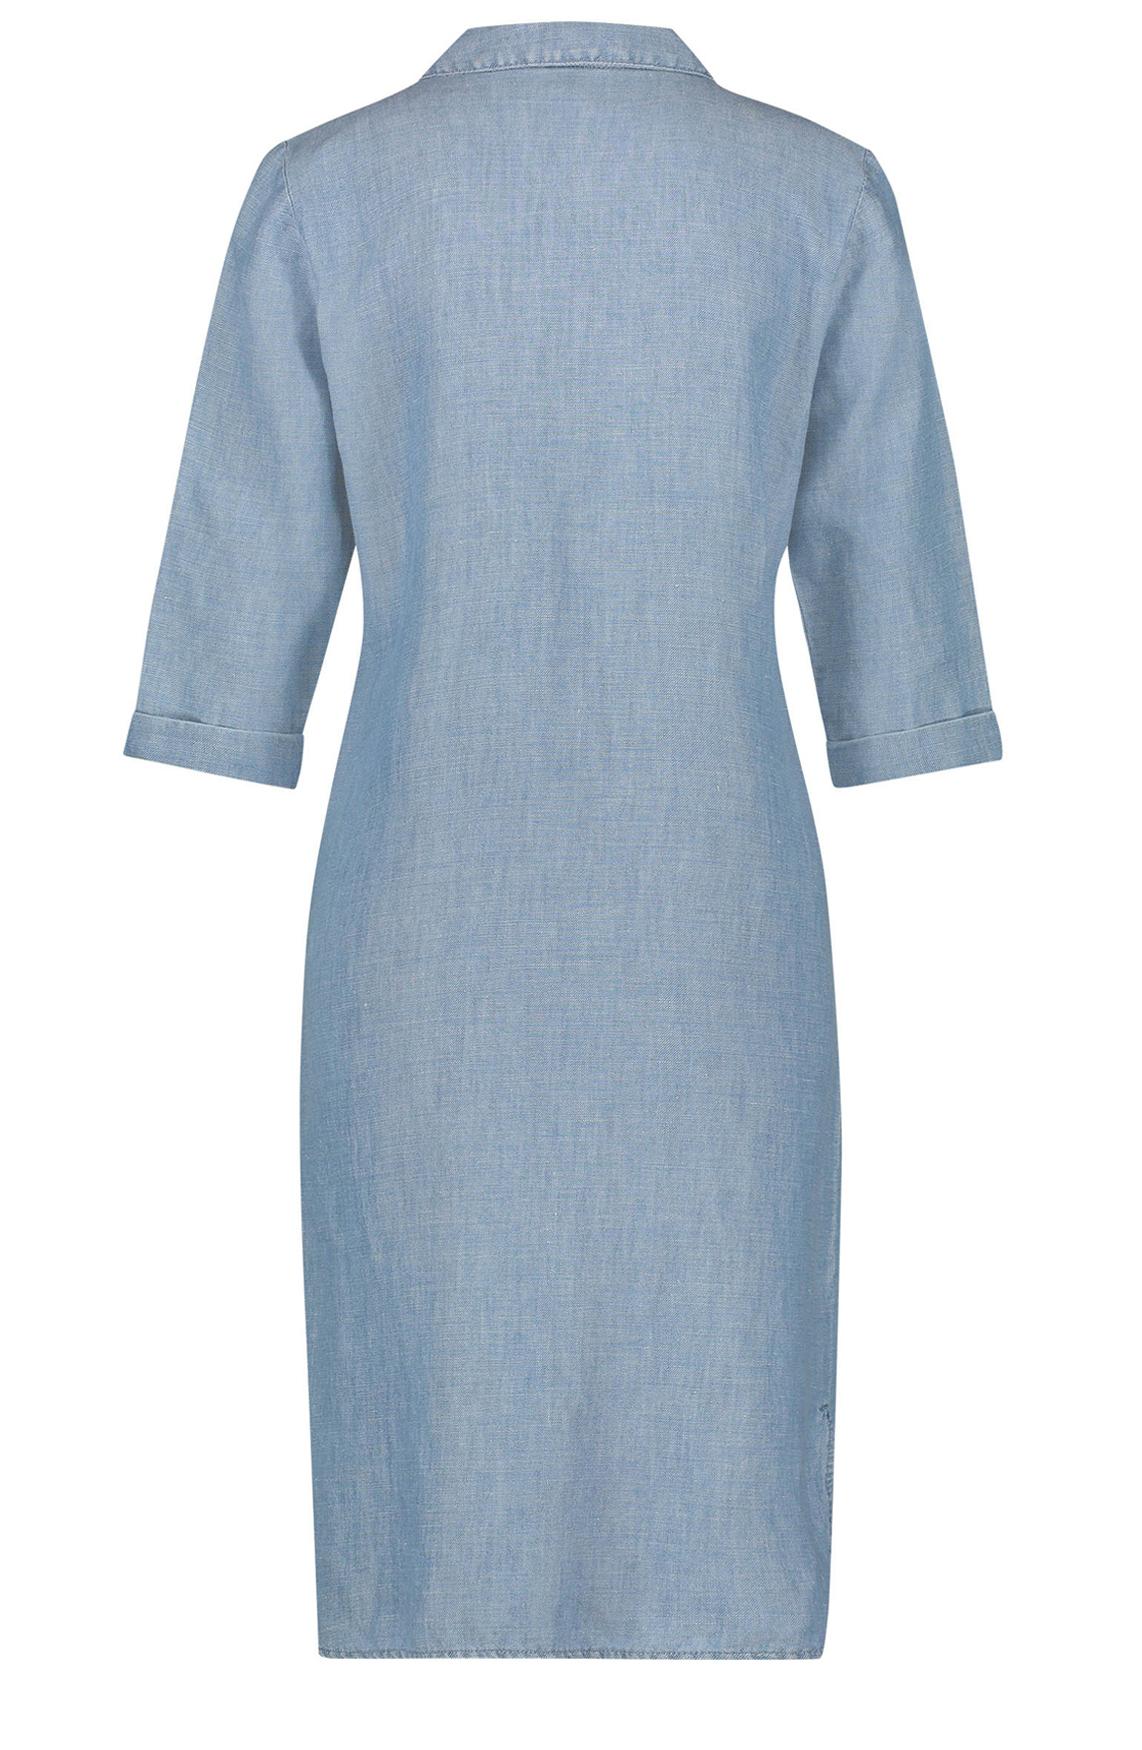 Penn & Ink Dames Denim jurk Blauw